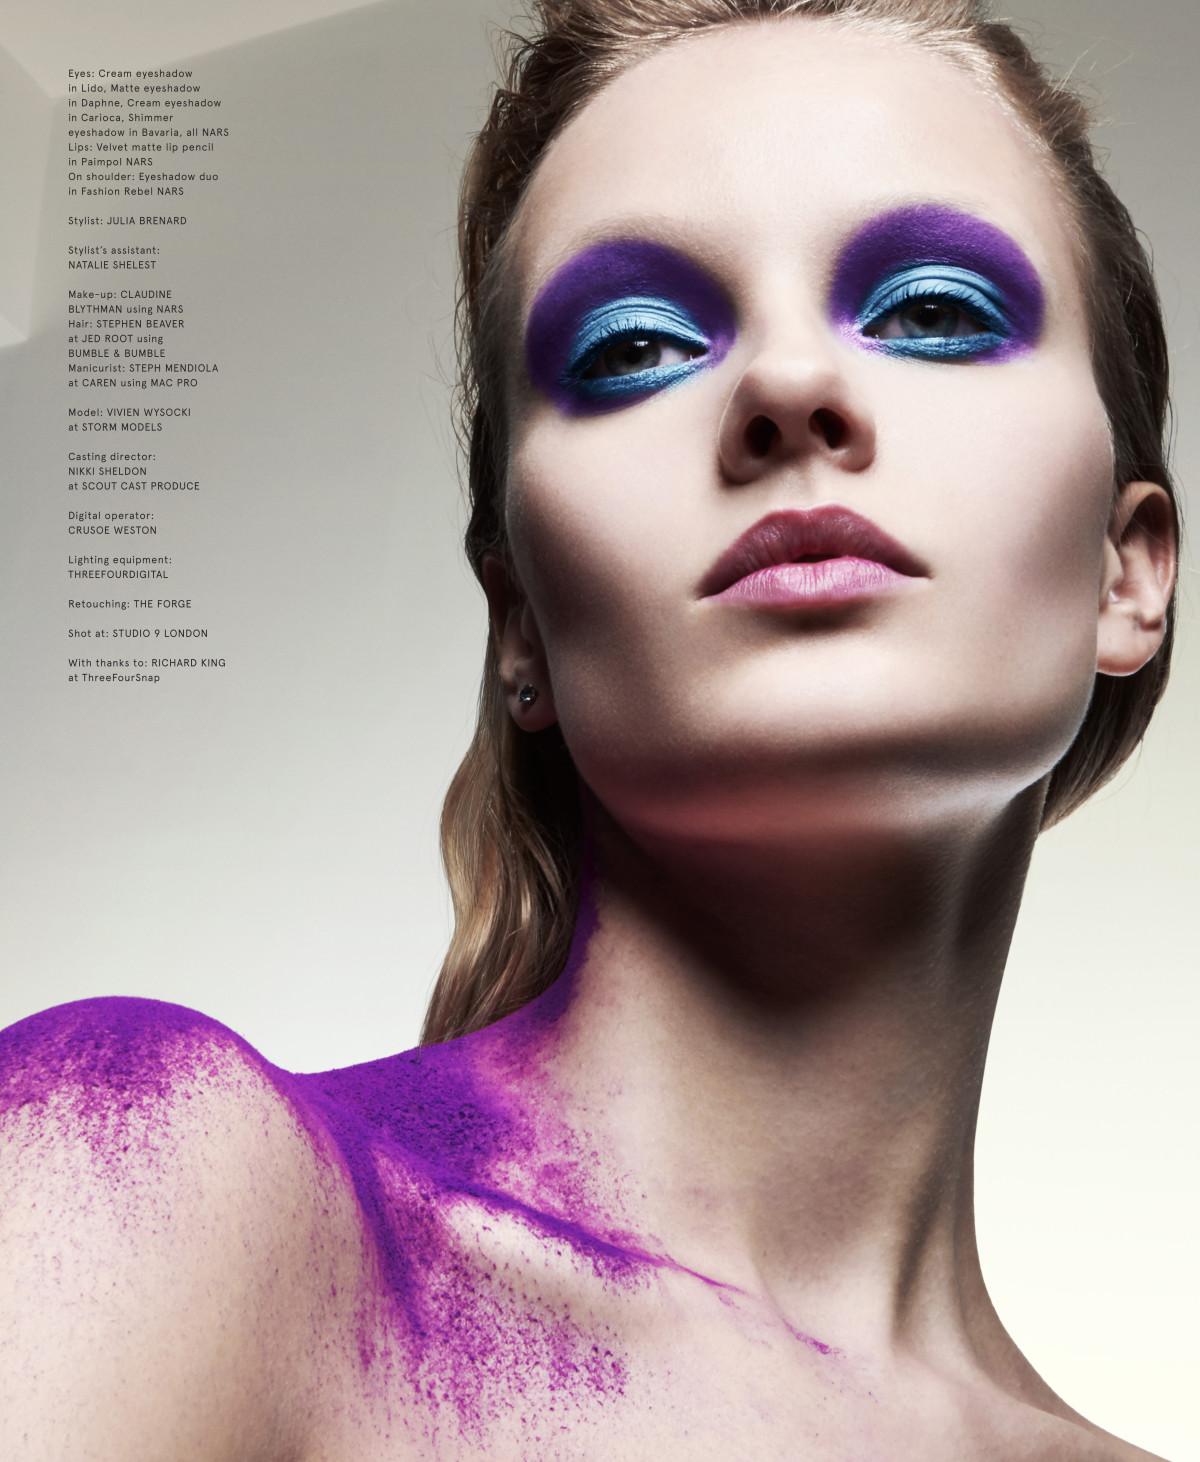 Volt Magazine, Pink Lips, Bleached Eyebrows, Purple Pigment, Blue Eyeshadow, Purple Eyeshadow, Grunge Makeup, Vivien Wysocki, Nars